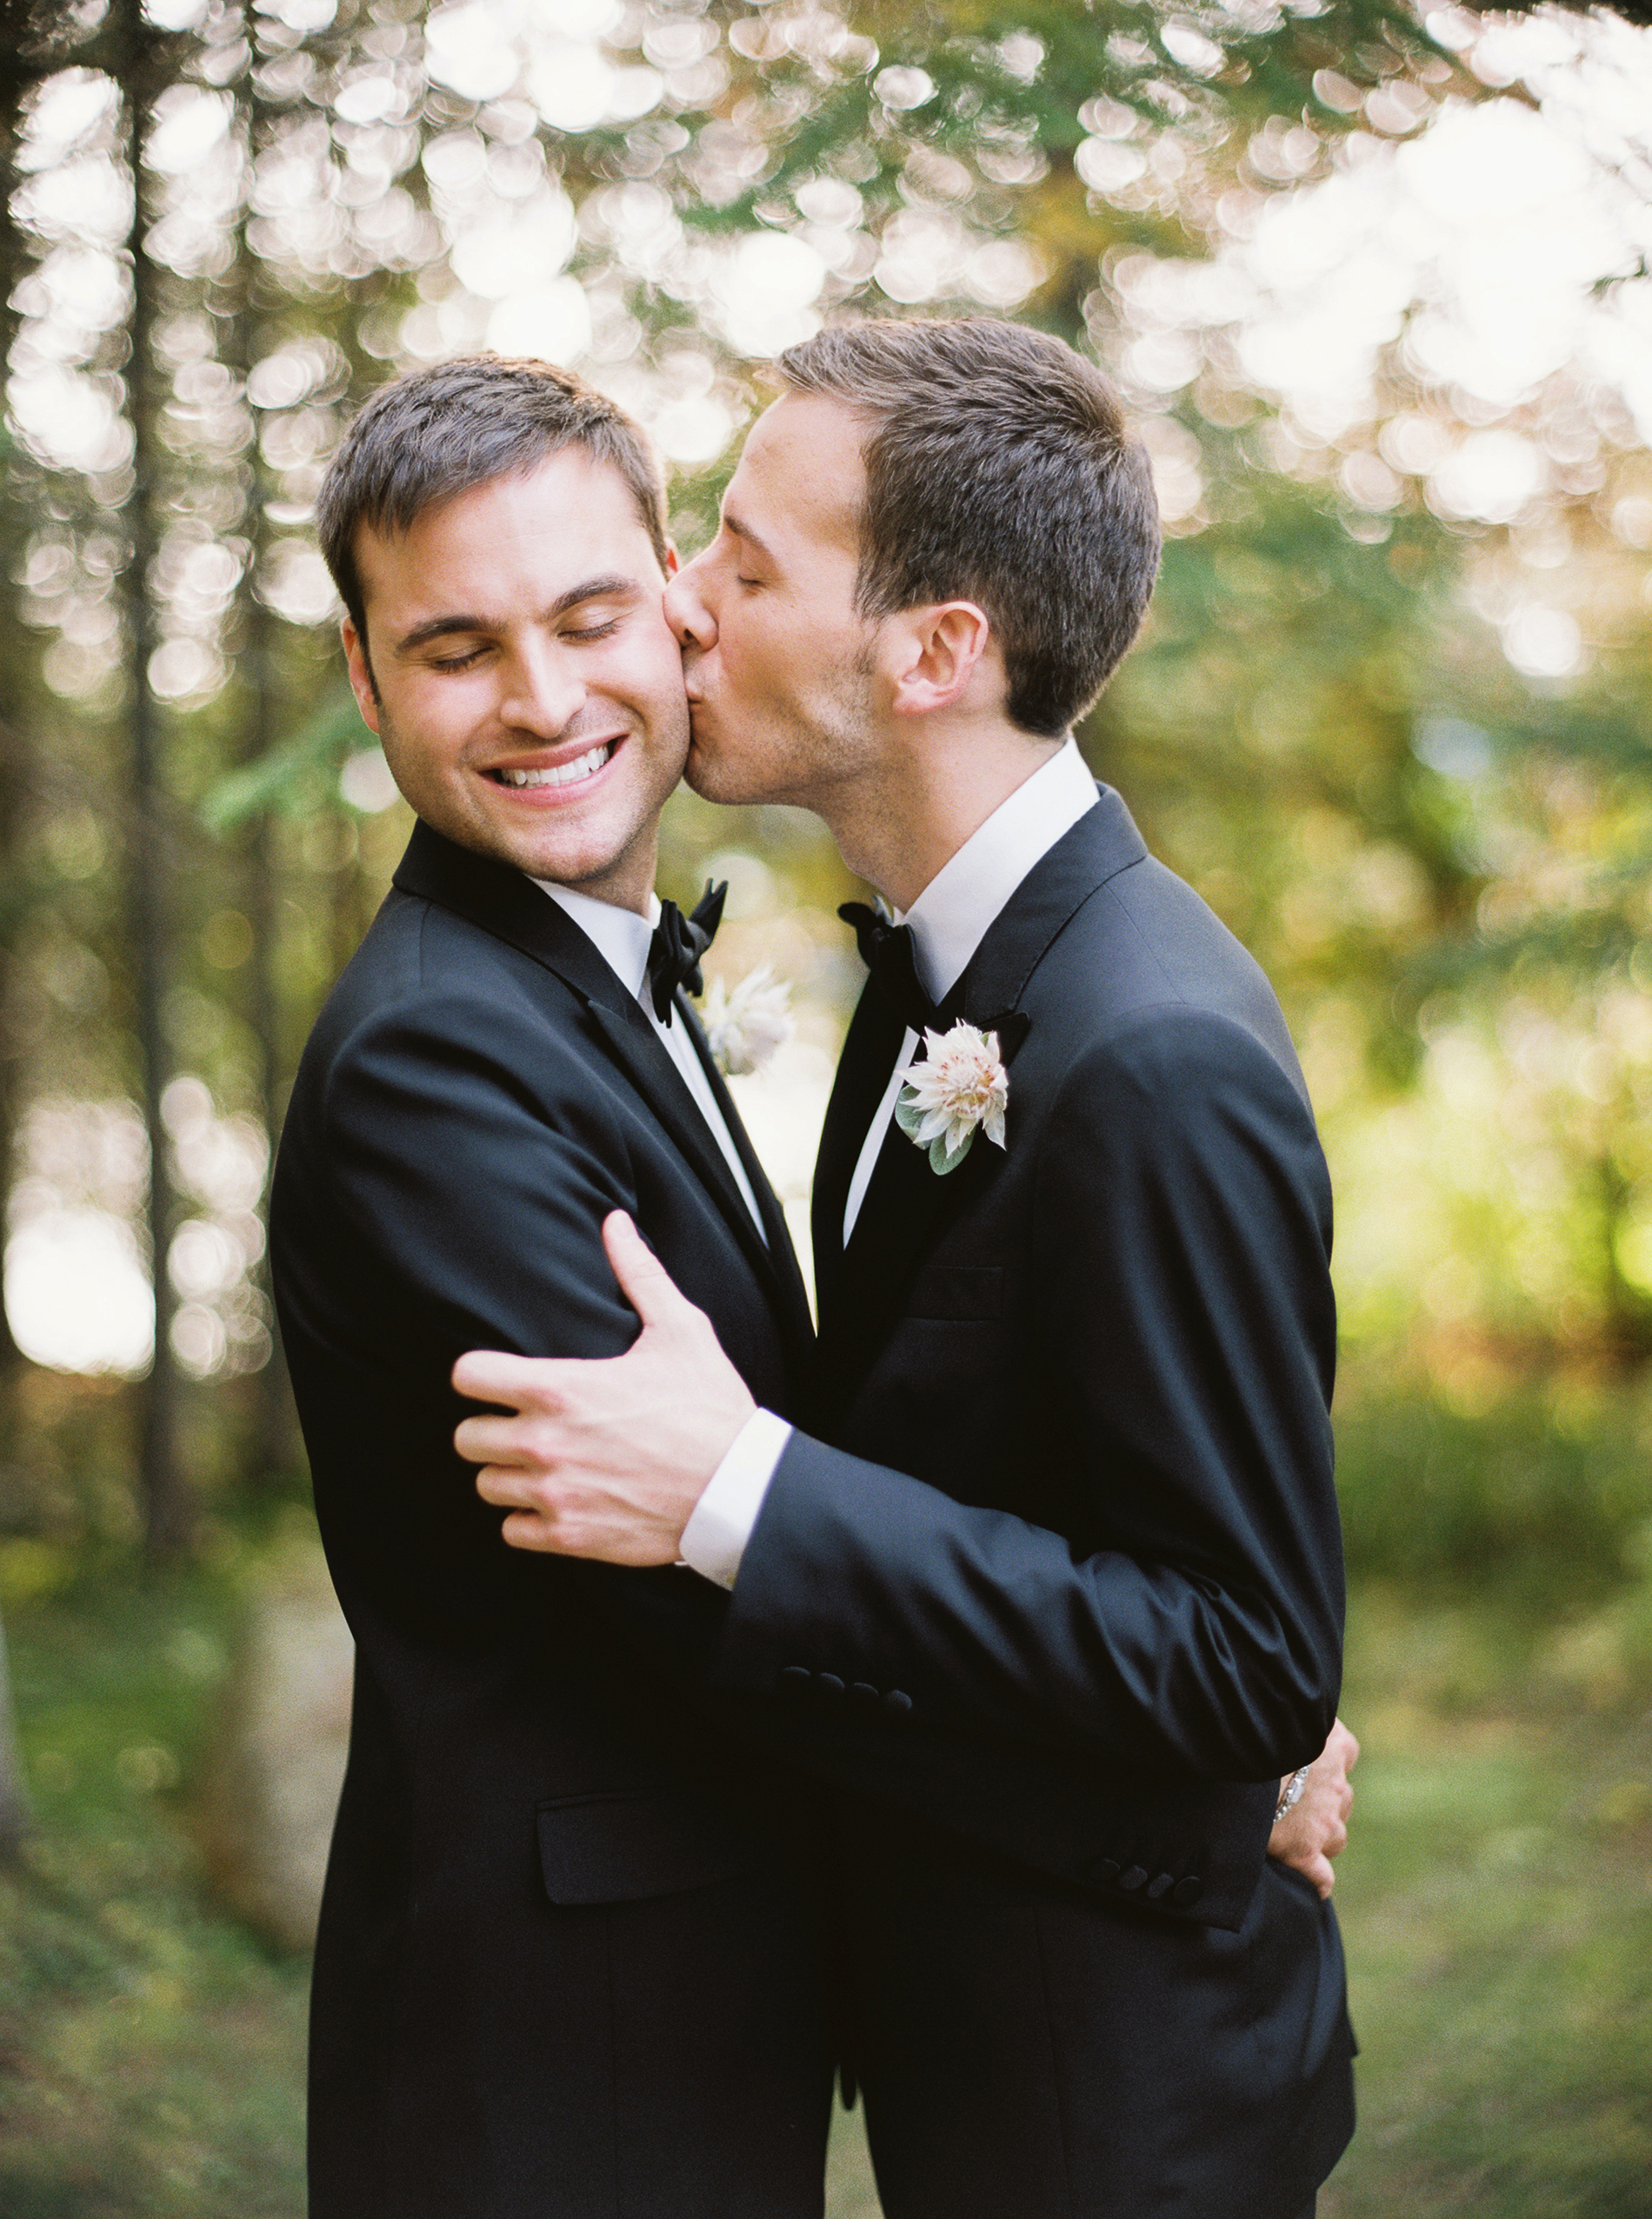 tory sean wedding lake placid new york couple kiss grooms